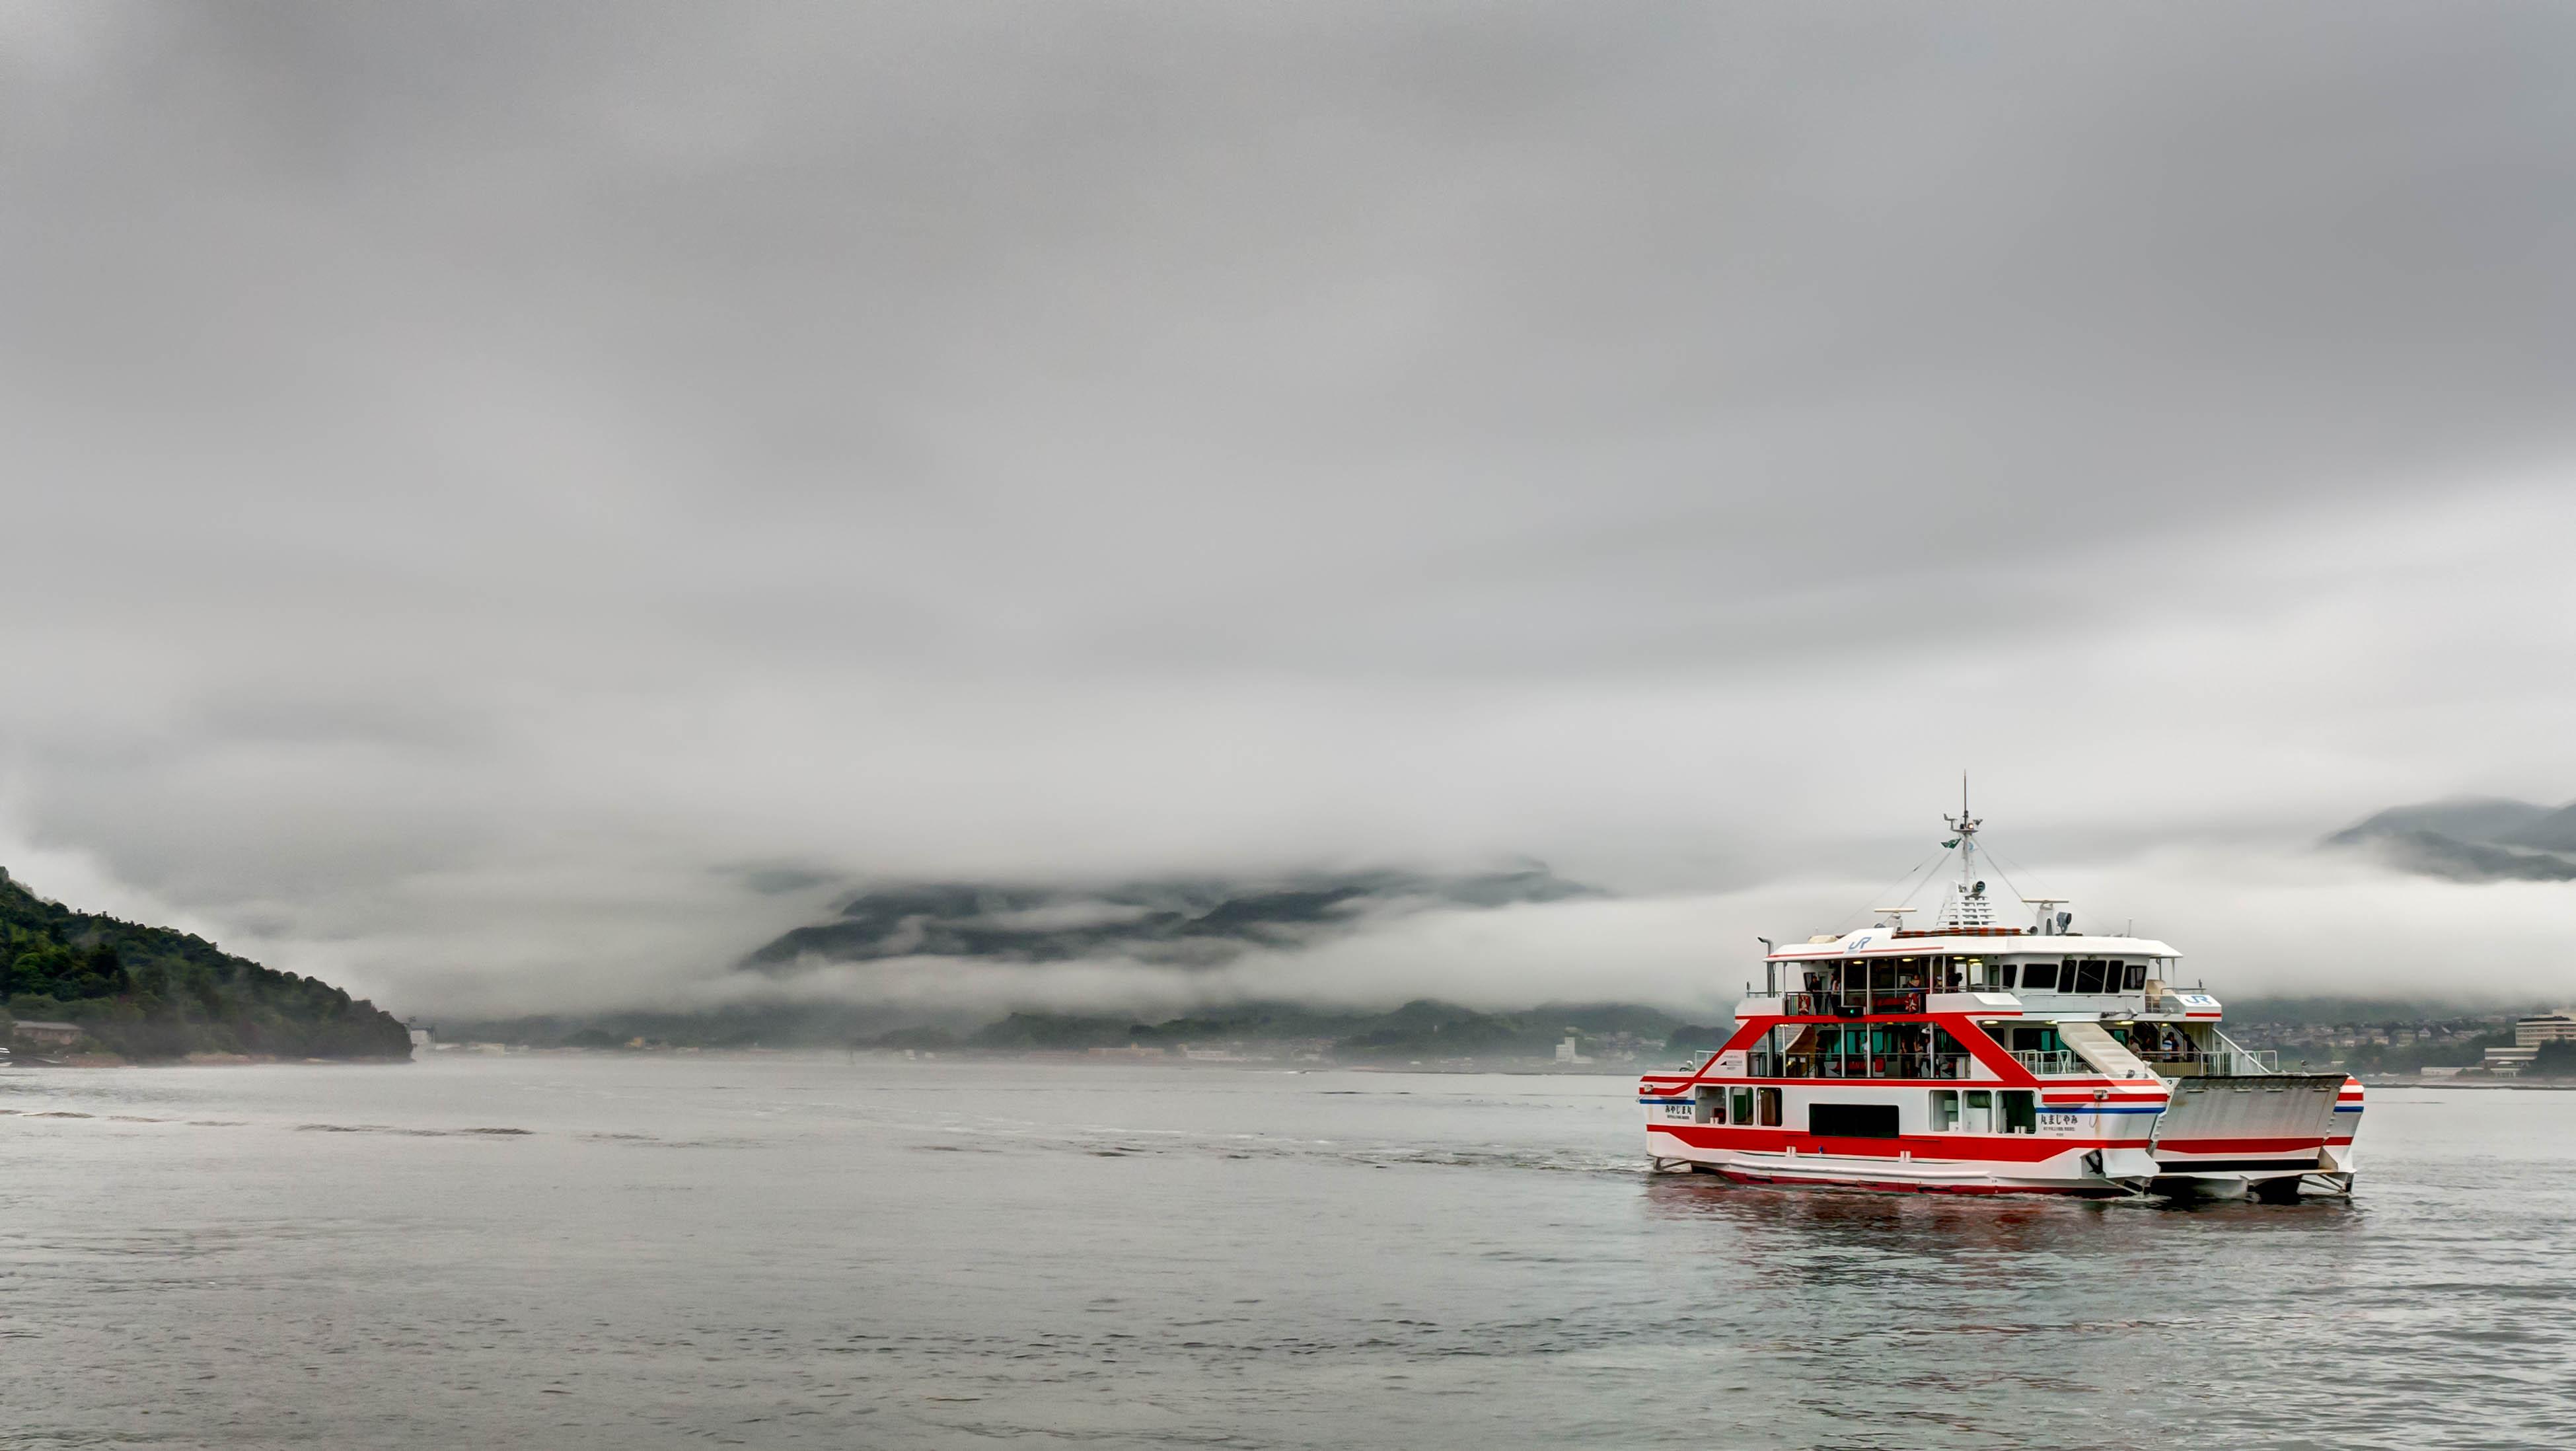 The Miyajima Ferry, 2014, Outdoor, Water, Vehicle, HQ Photo